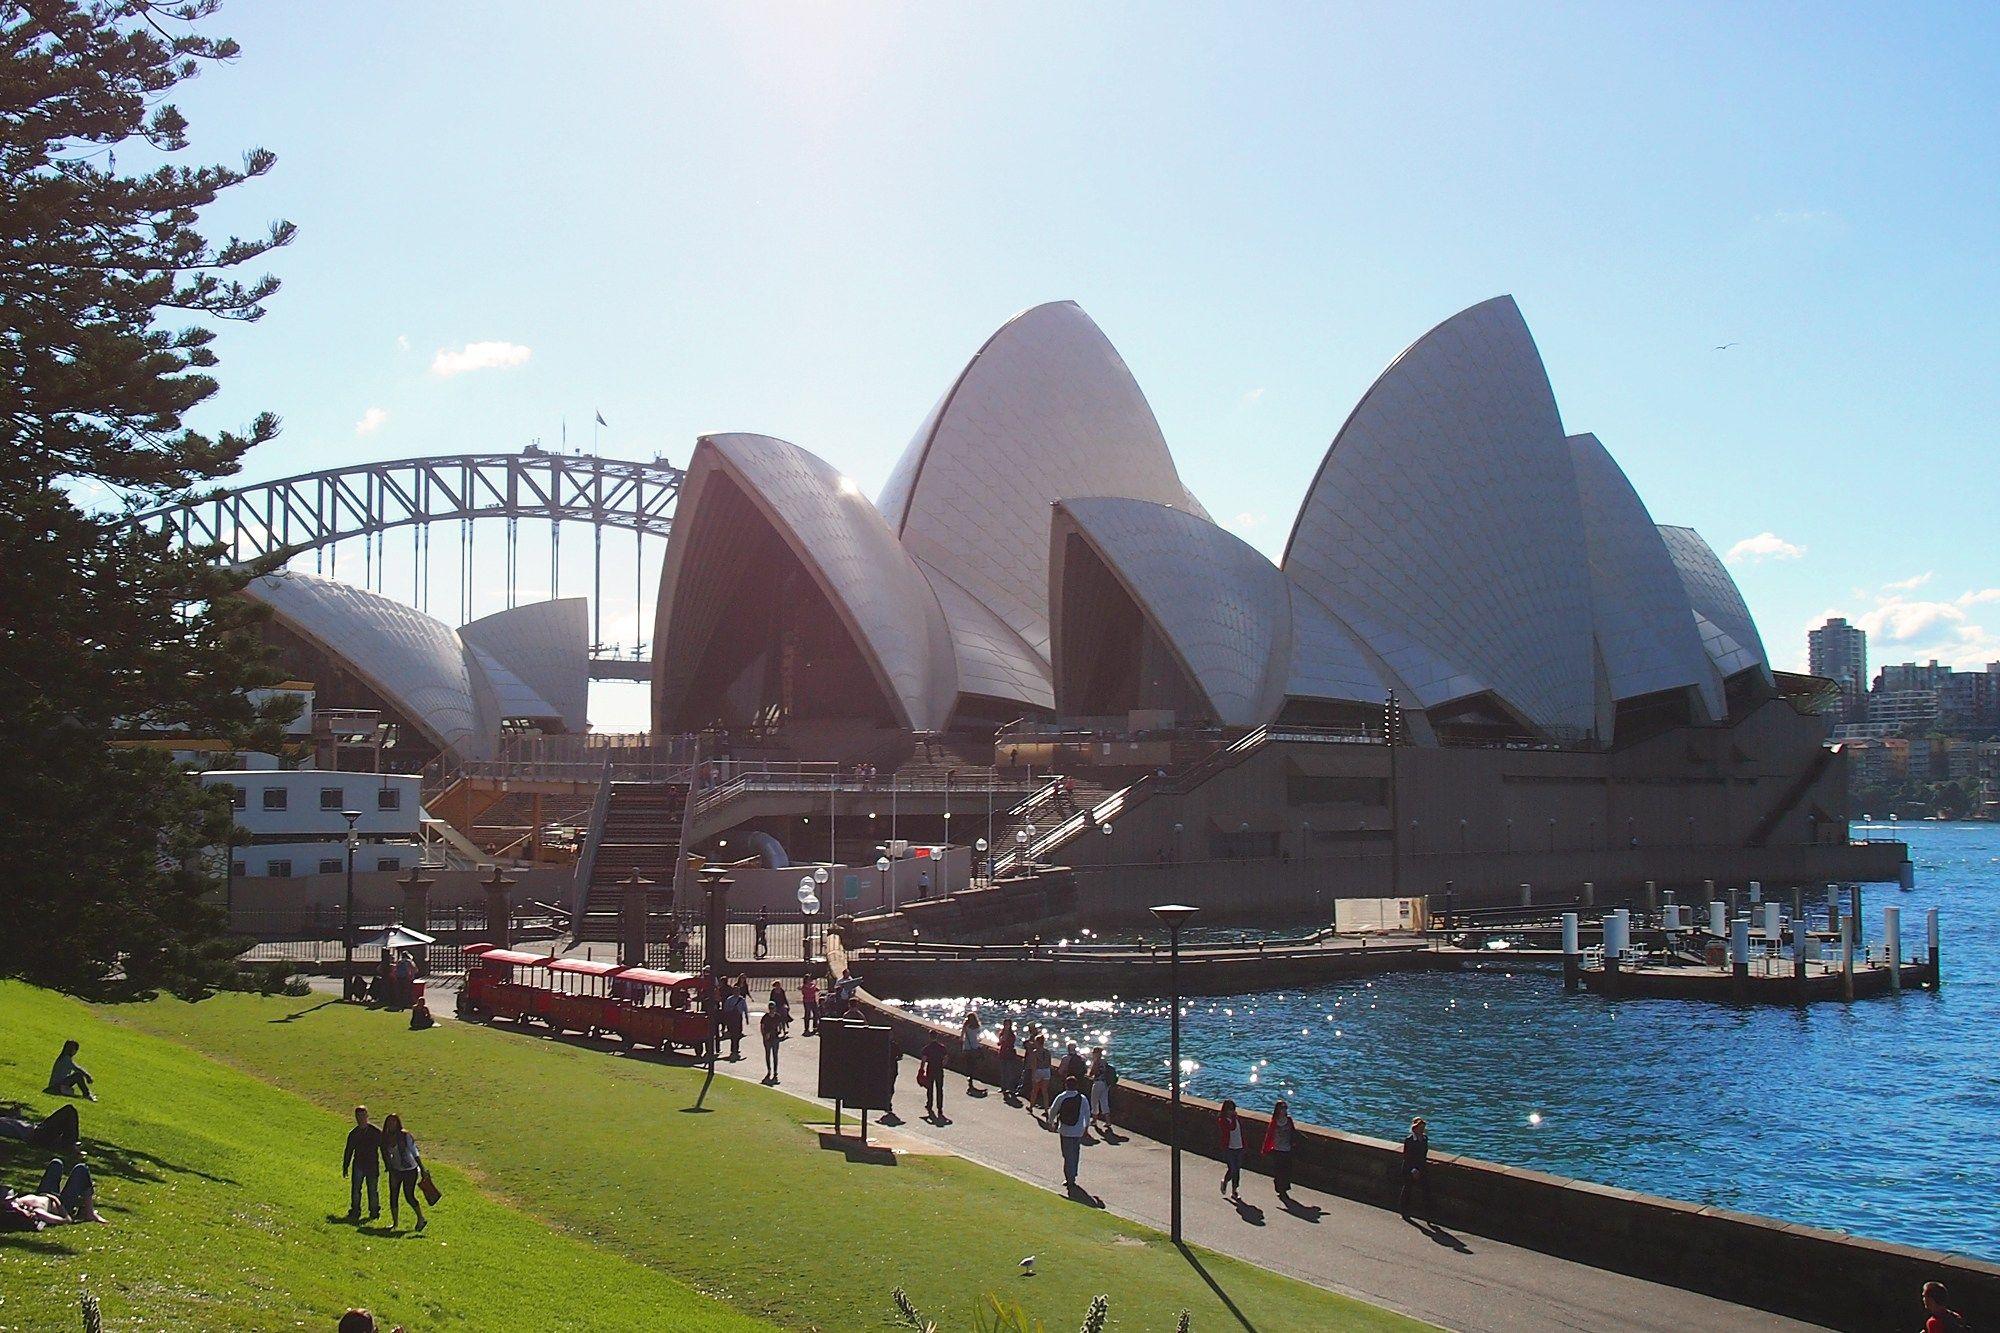 a1108db10d502f9f807534f3e0185449 - Sydney Opera House To Botanic Gardens Walk